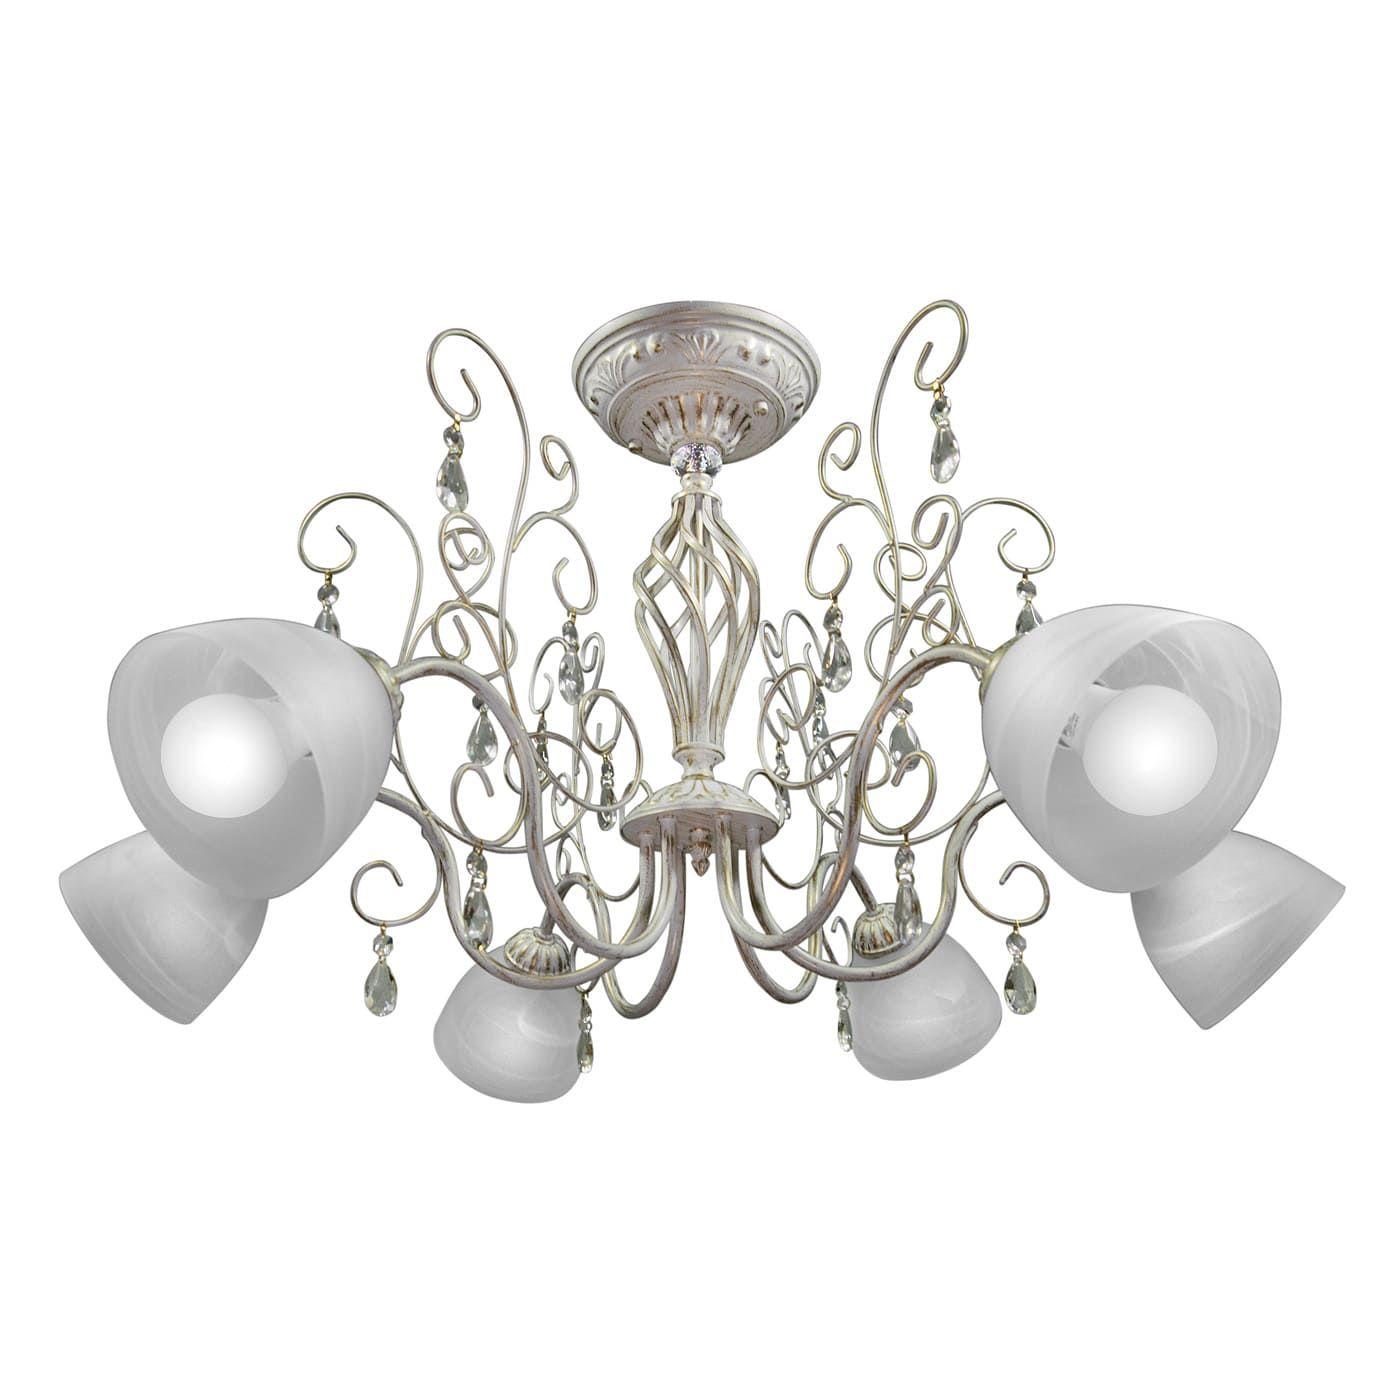 PETRASVET / Ceiling chandelier S2372-6, 6xE27 max. 60W